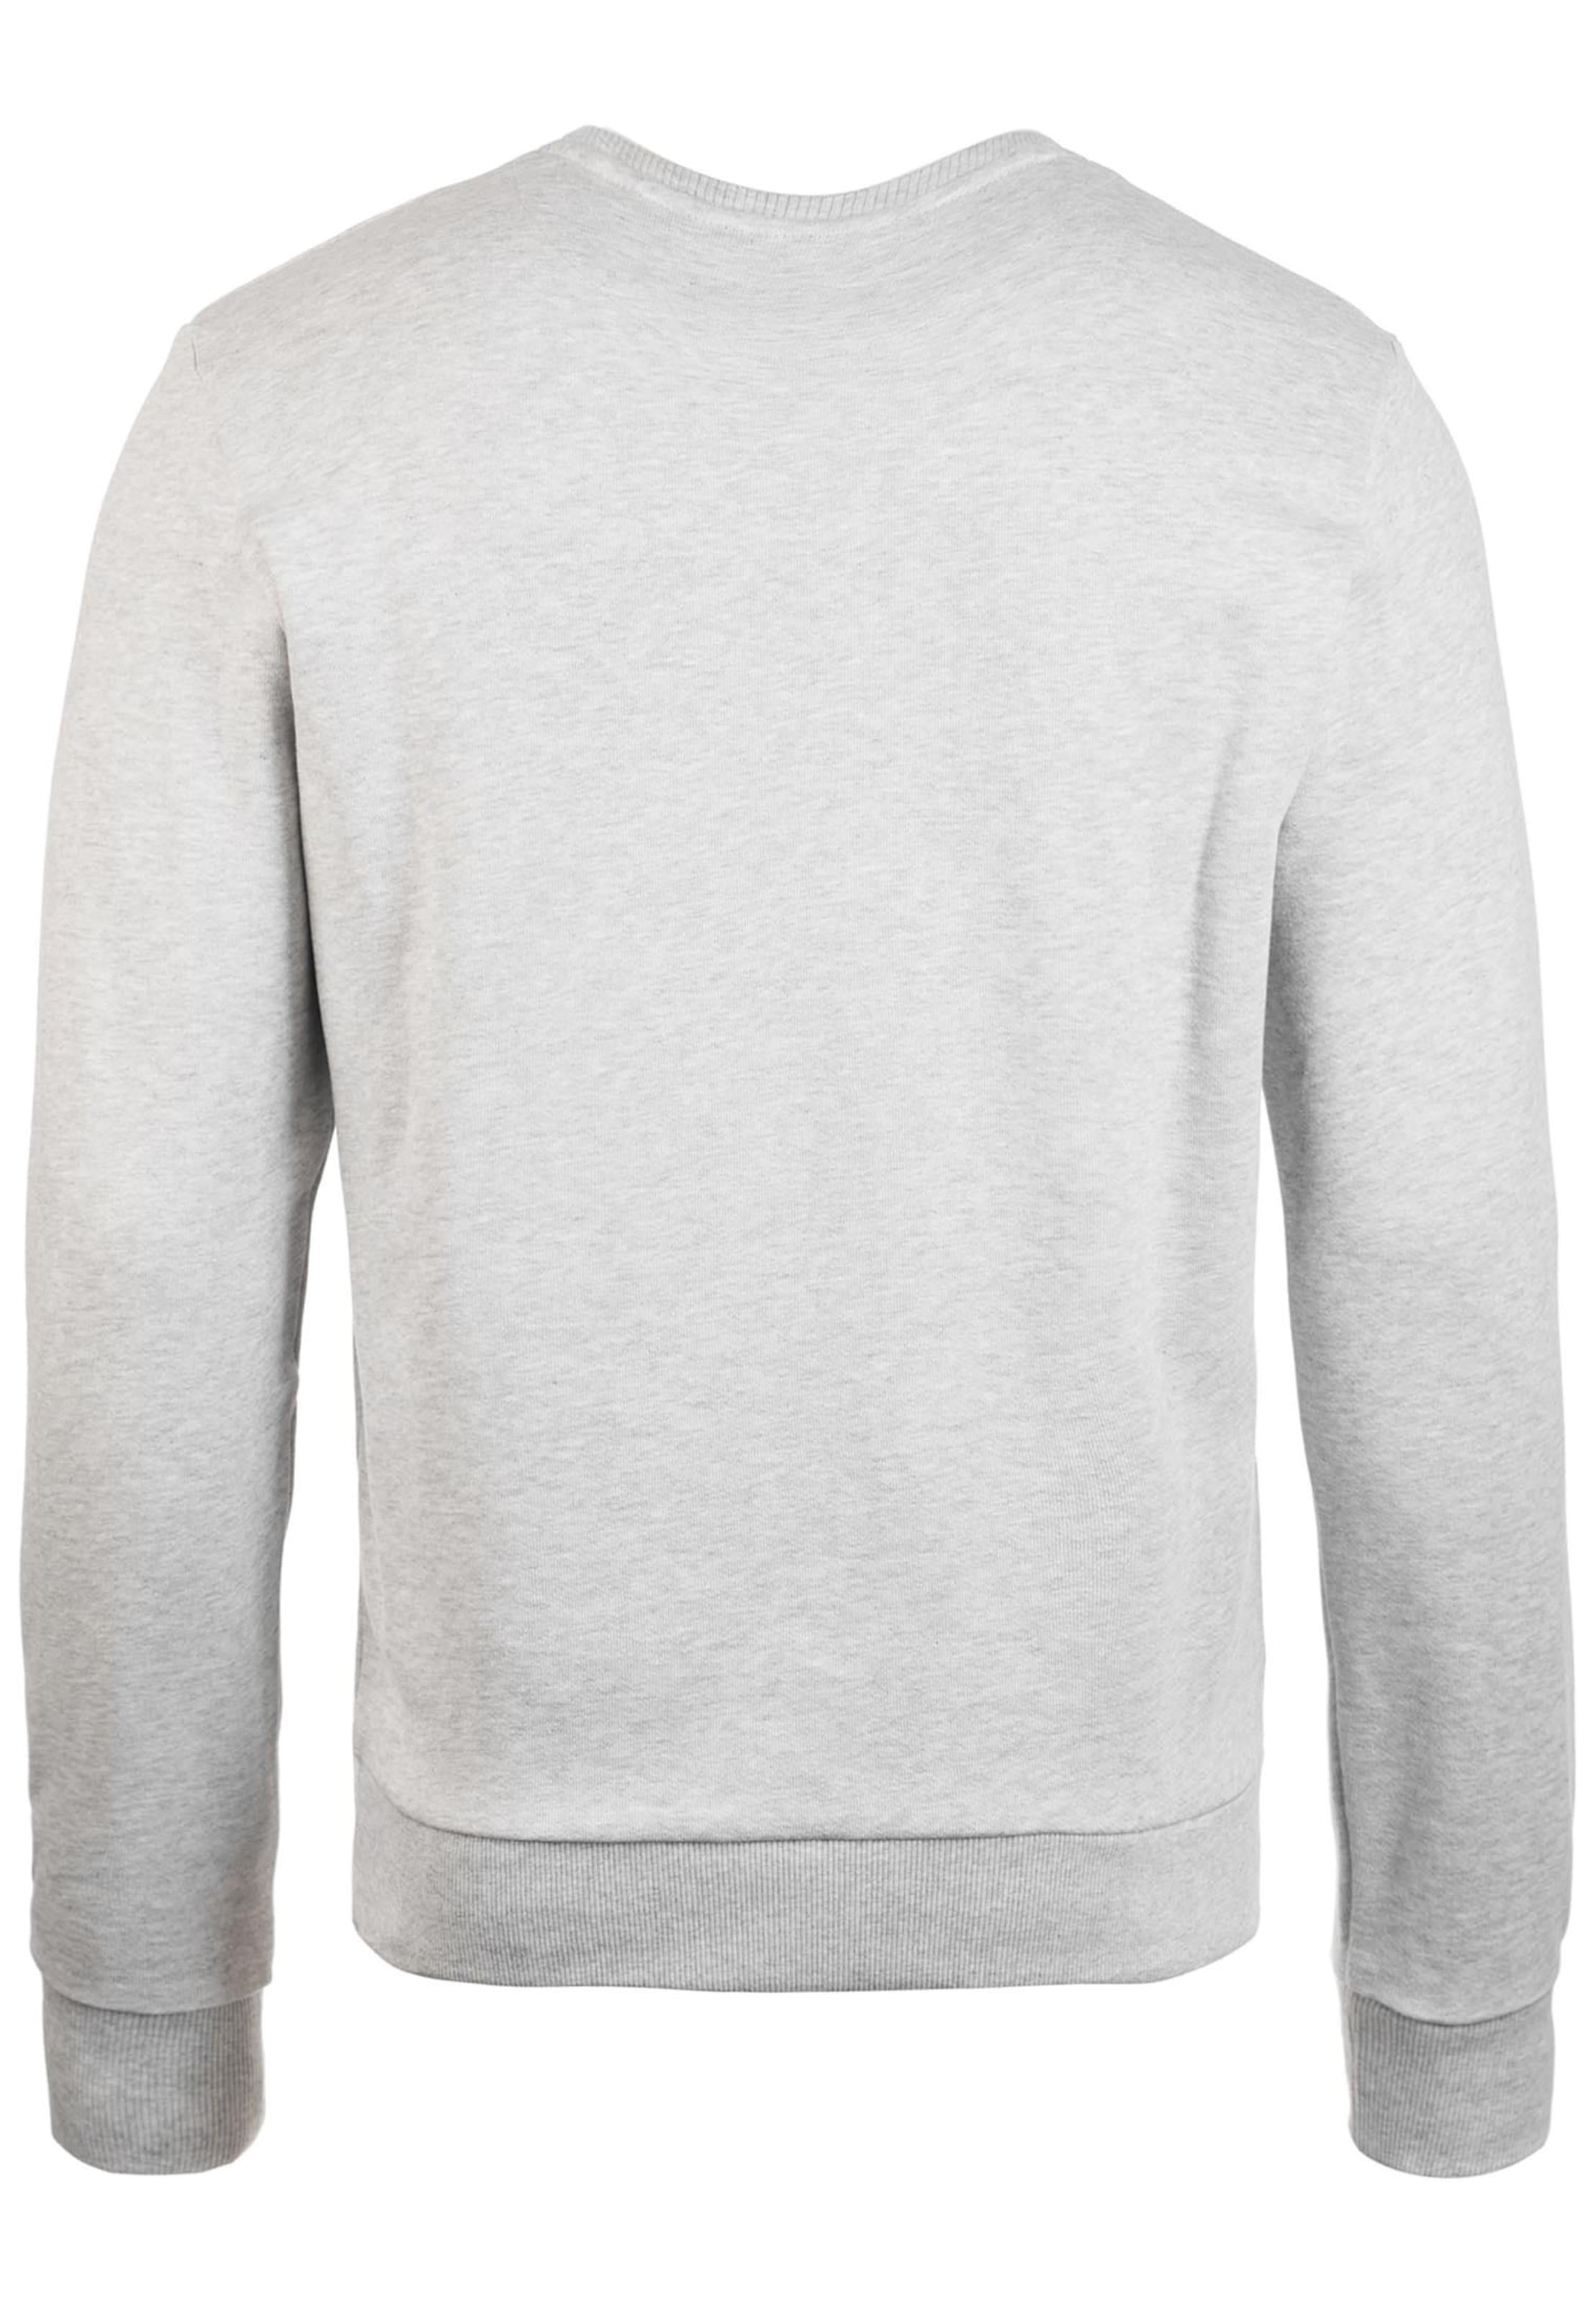 Chiné Sweat shirt Scott Lyleamp; JauneGris En shrdxCtQ